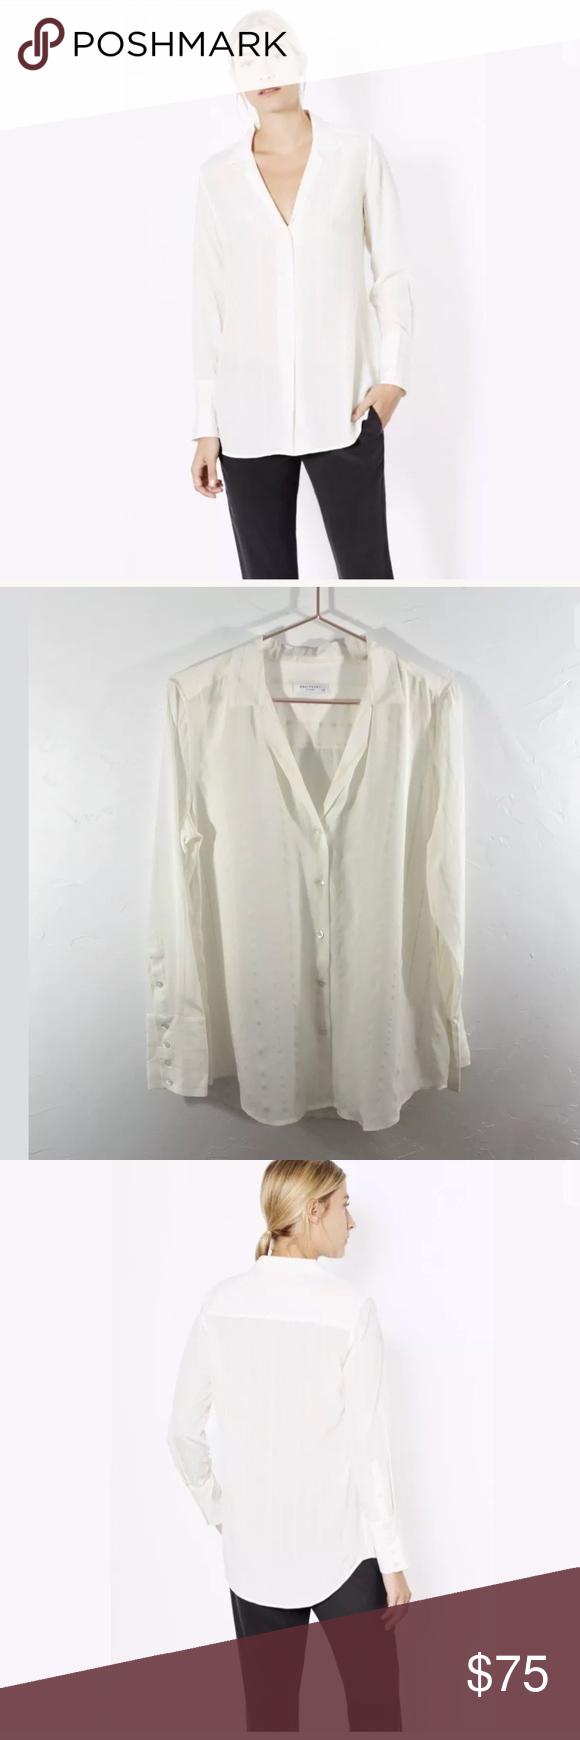 b1cbef919505c Equipment Femme May Striped 100% Silk Shirt Blouse Equipment Femme May  Striped 100% Silk Shirt Blouse Marshmallow Ecru  268 A RELAXED